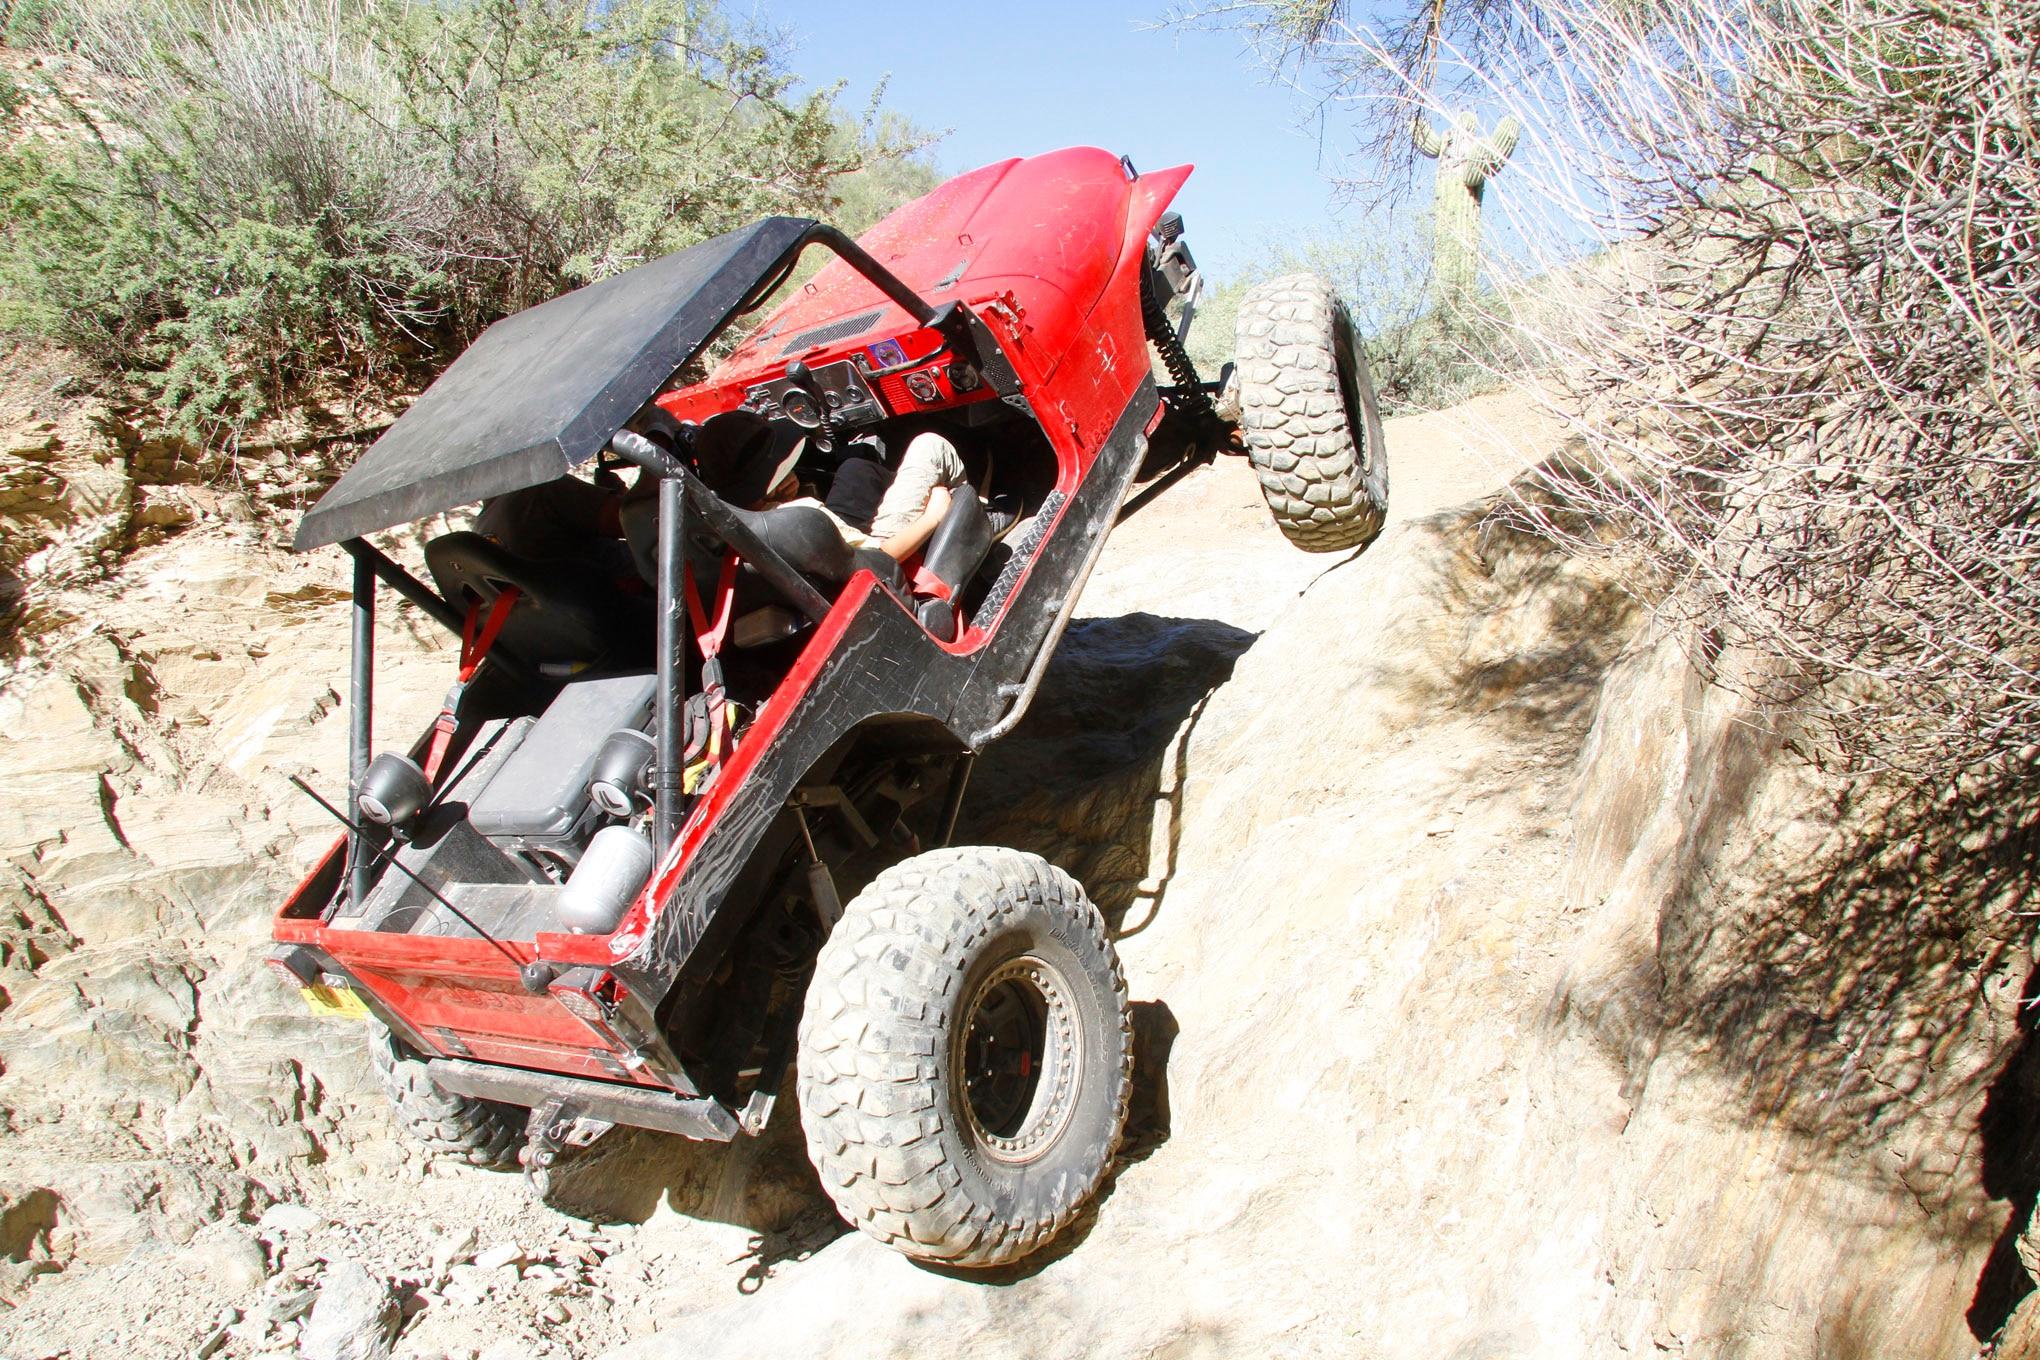 017 table mesa trails collateral damage 1983 scrambler